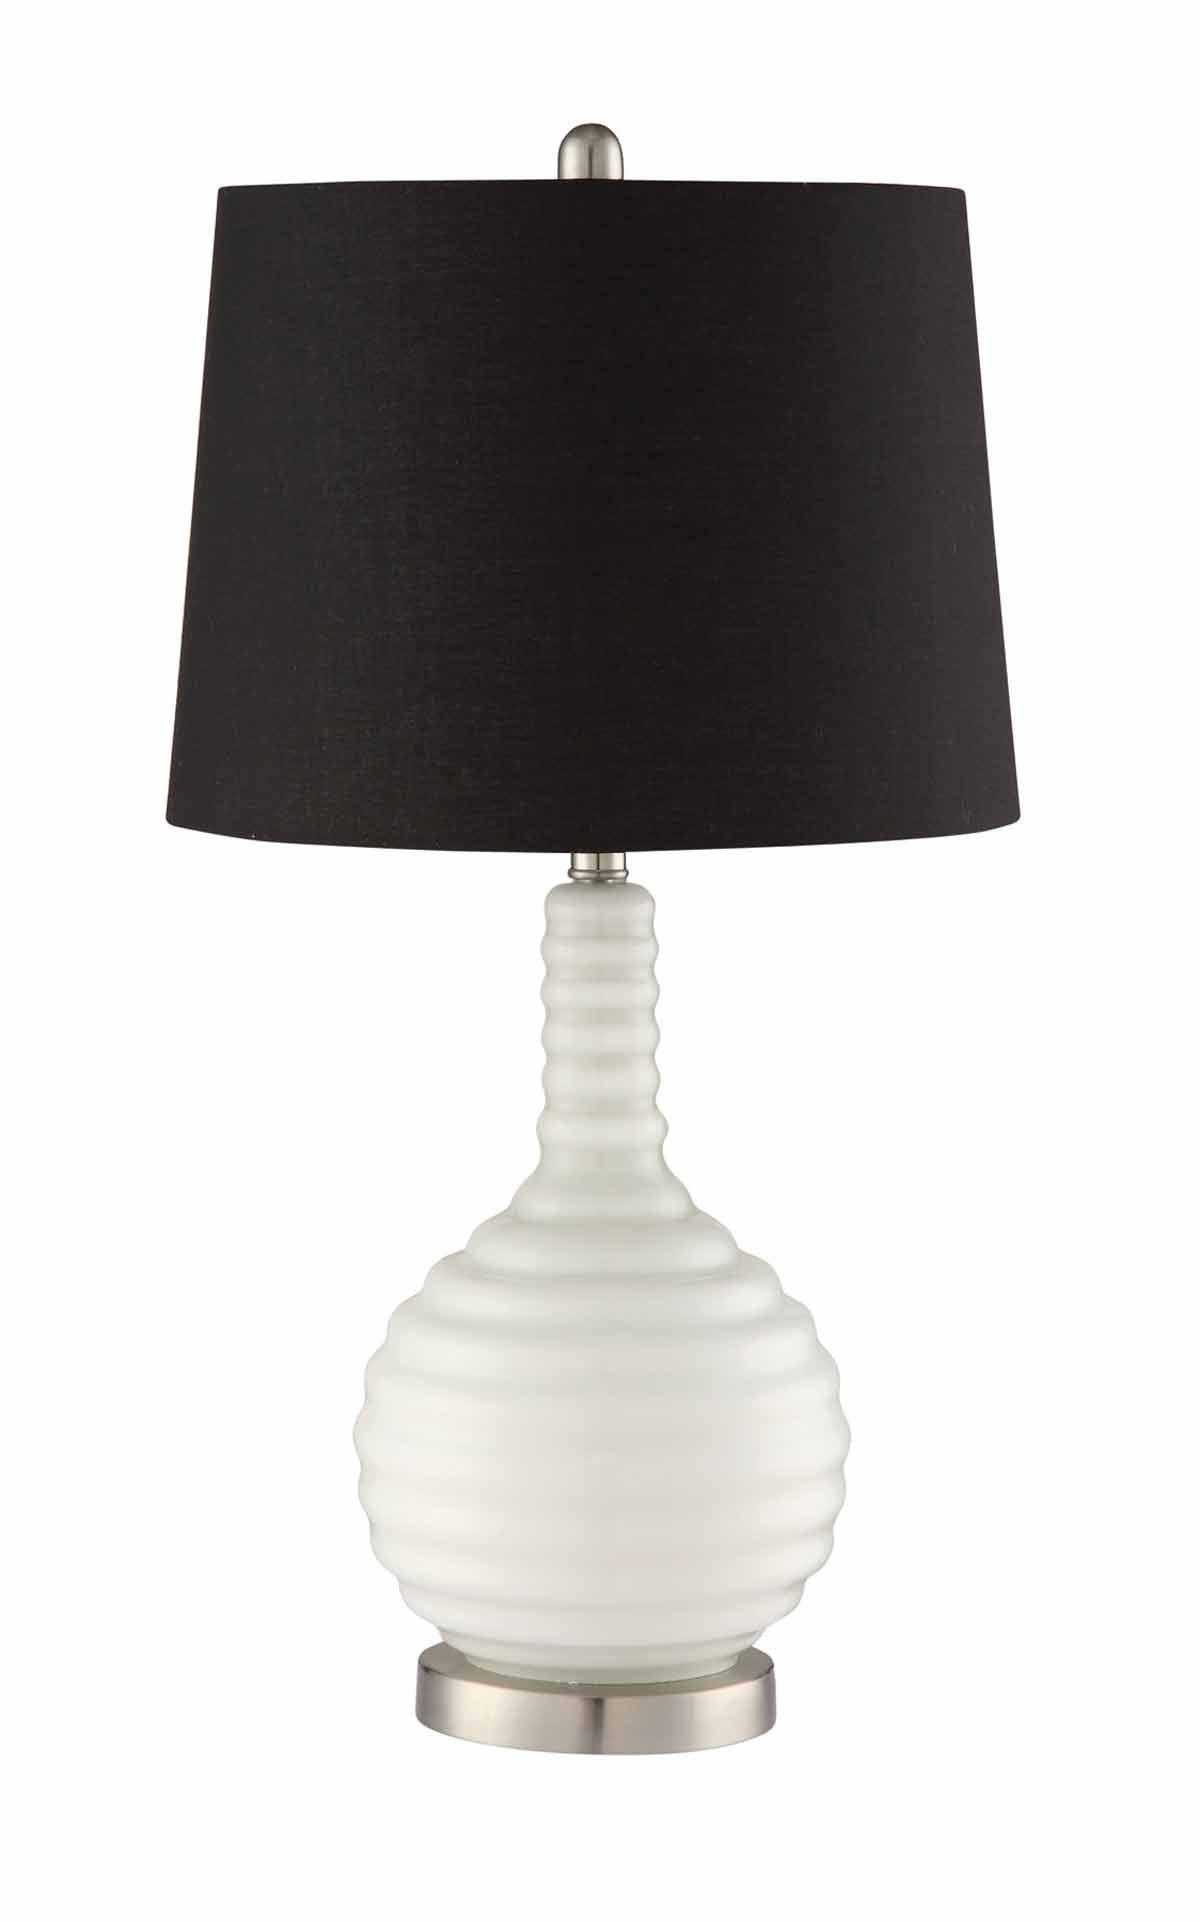 Coaster 901520 Table Lamp - White